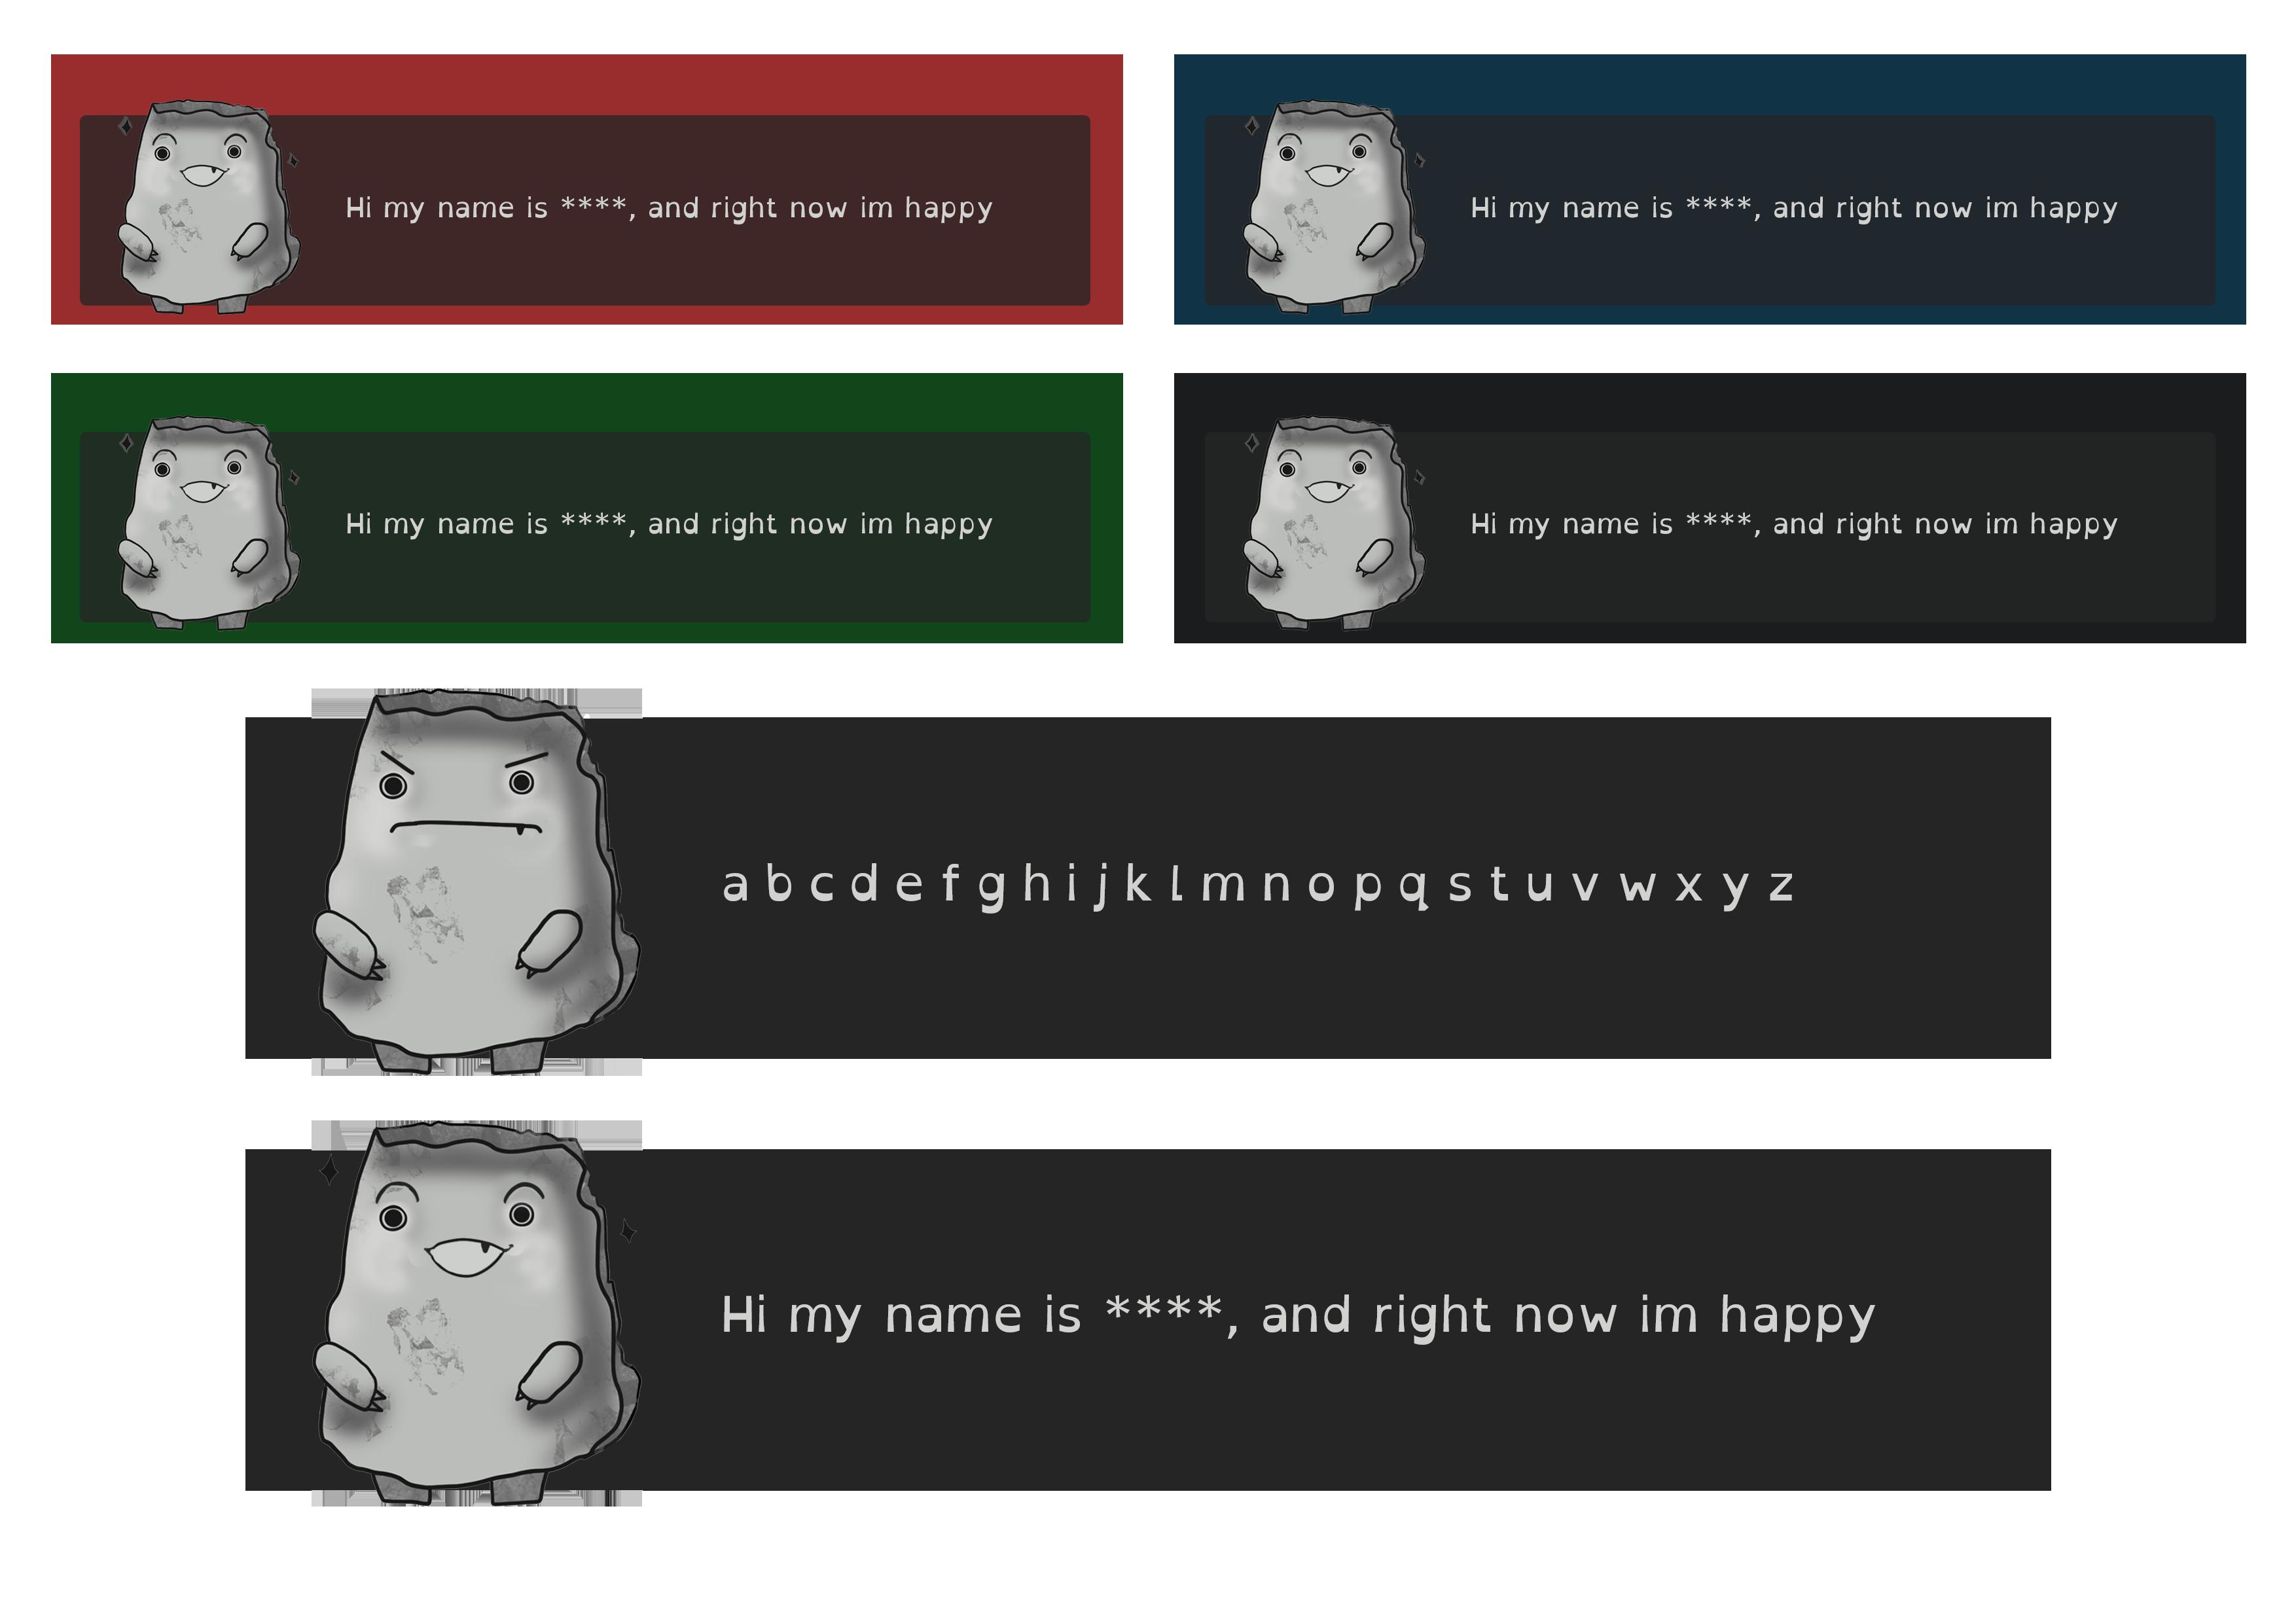 Dialogue box examples